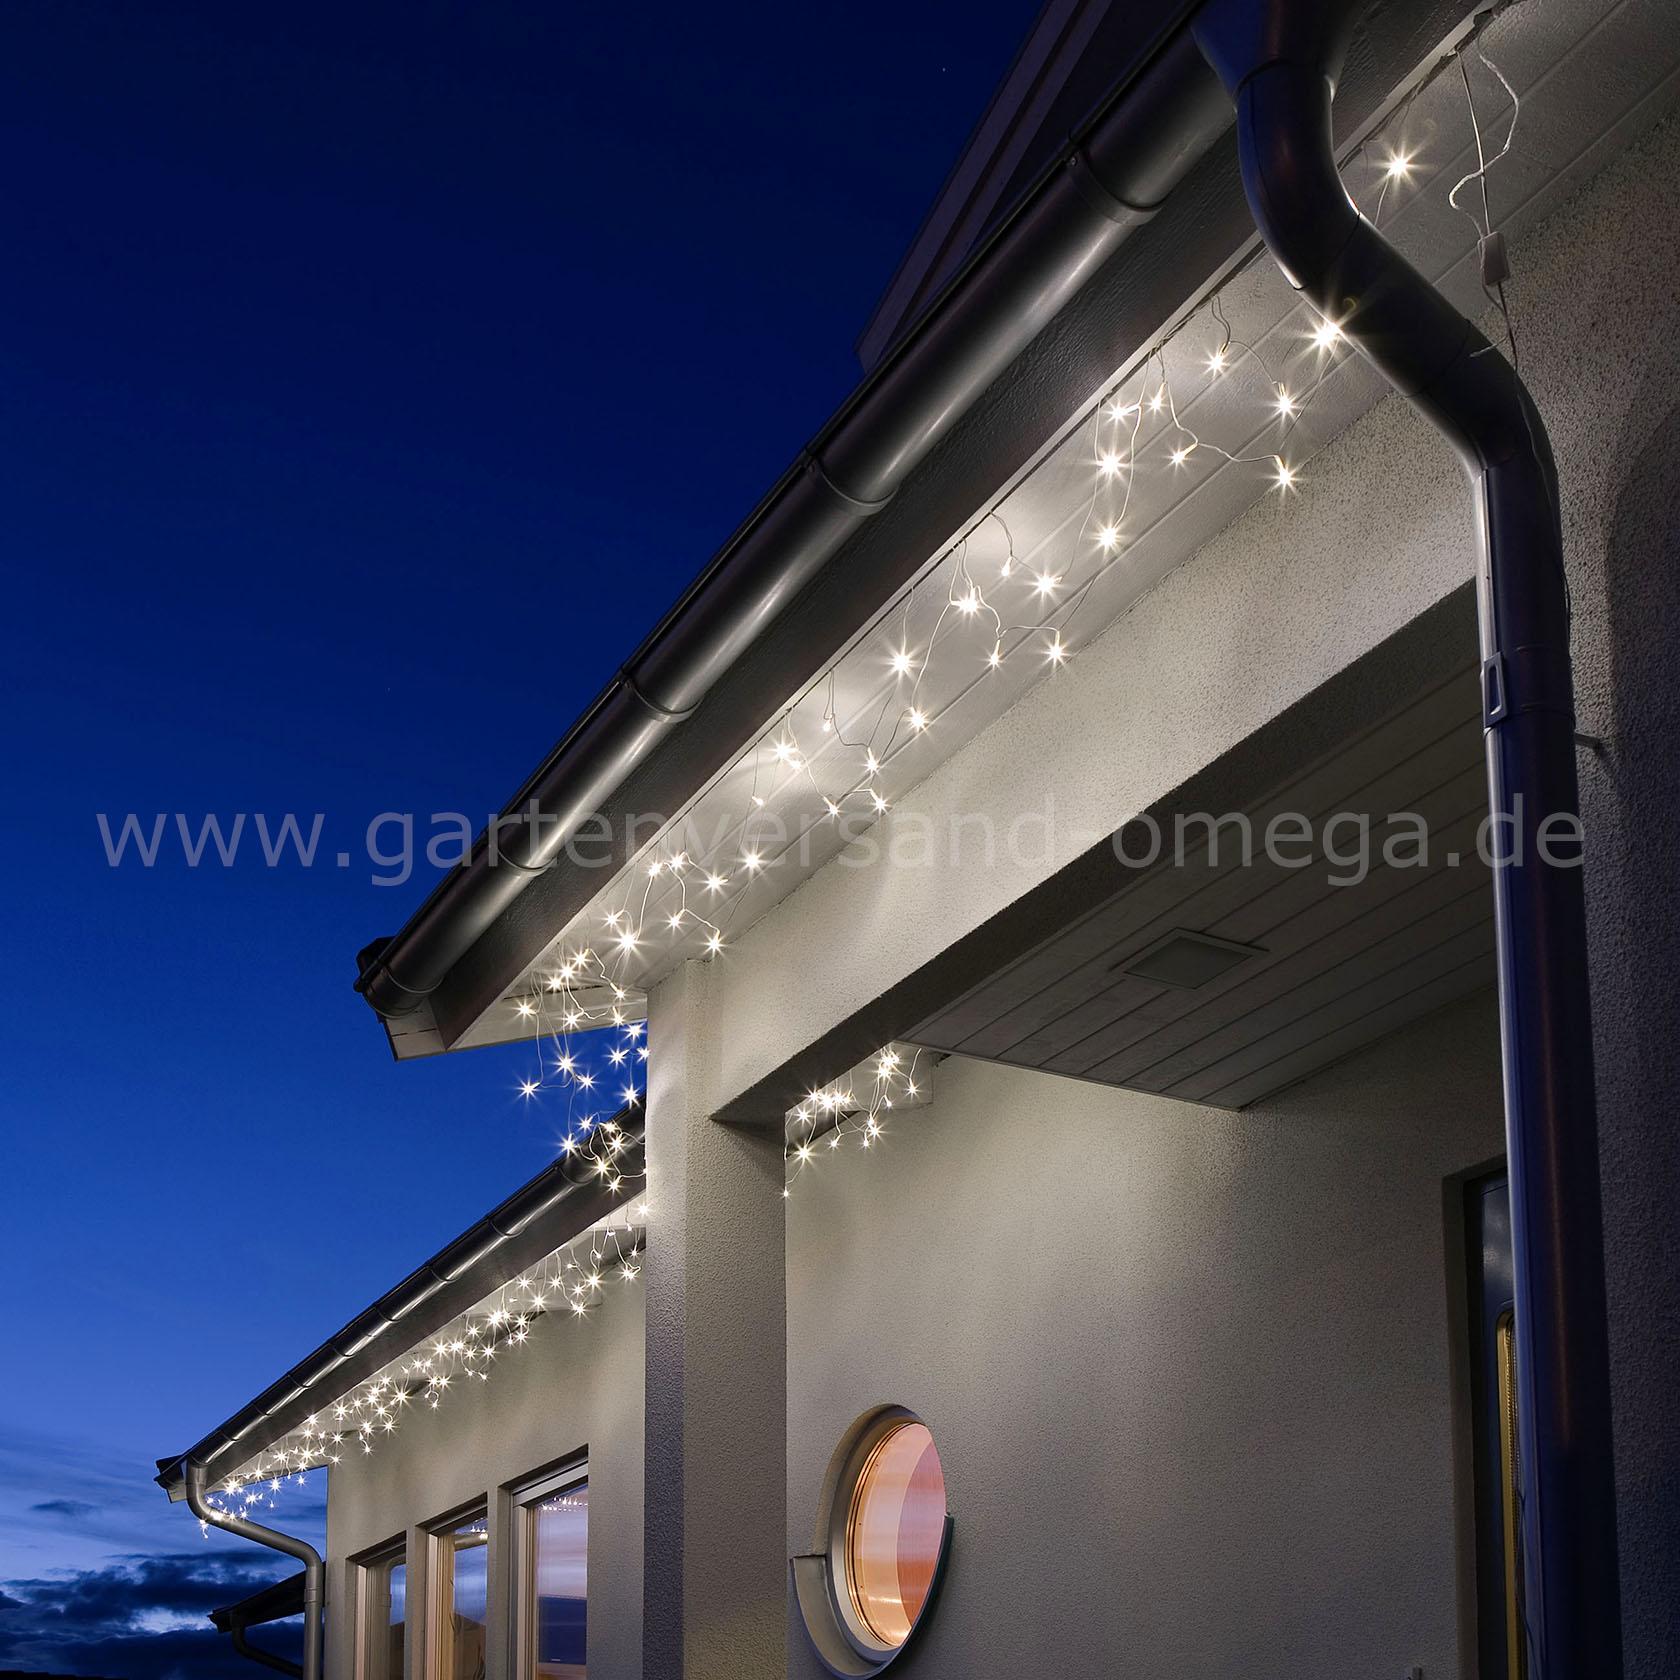 led dachrinnenlichterkette lichterkette f r dachrinnen weihnachtsau enbeleuchtung. Black Bedroom Furniture Sets. Home Design Ideas